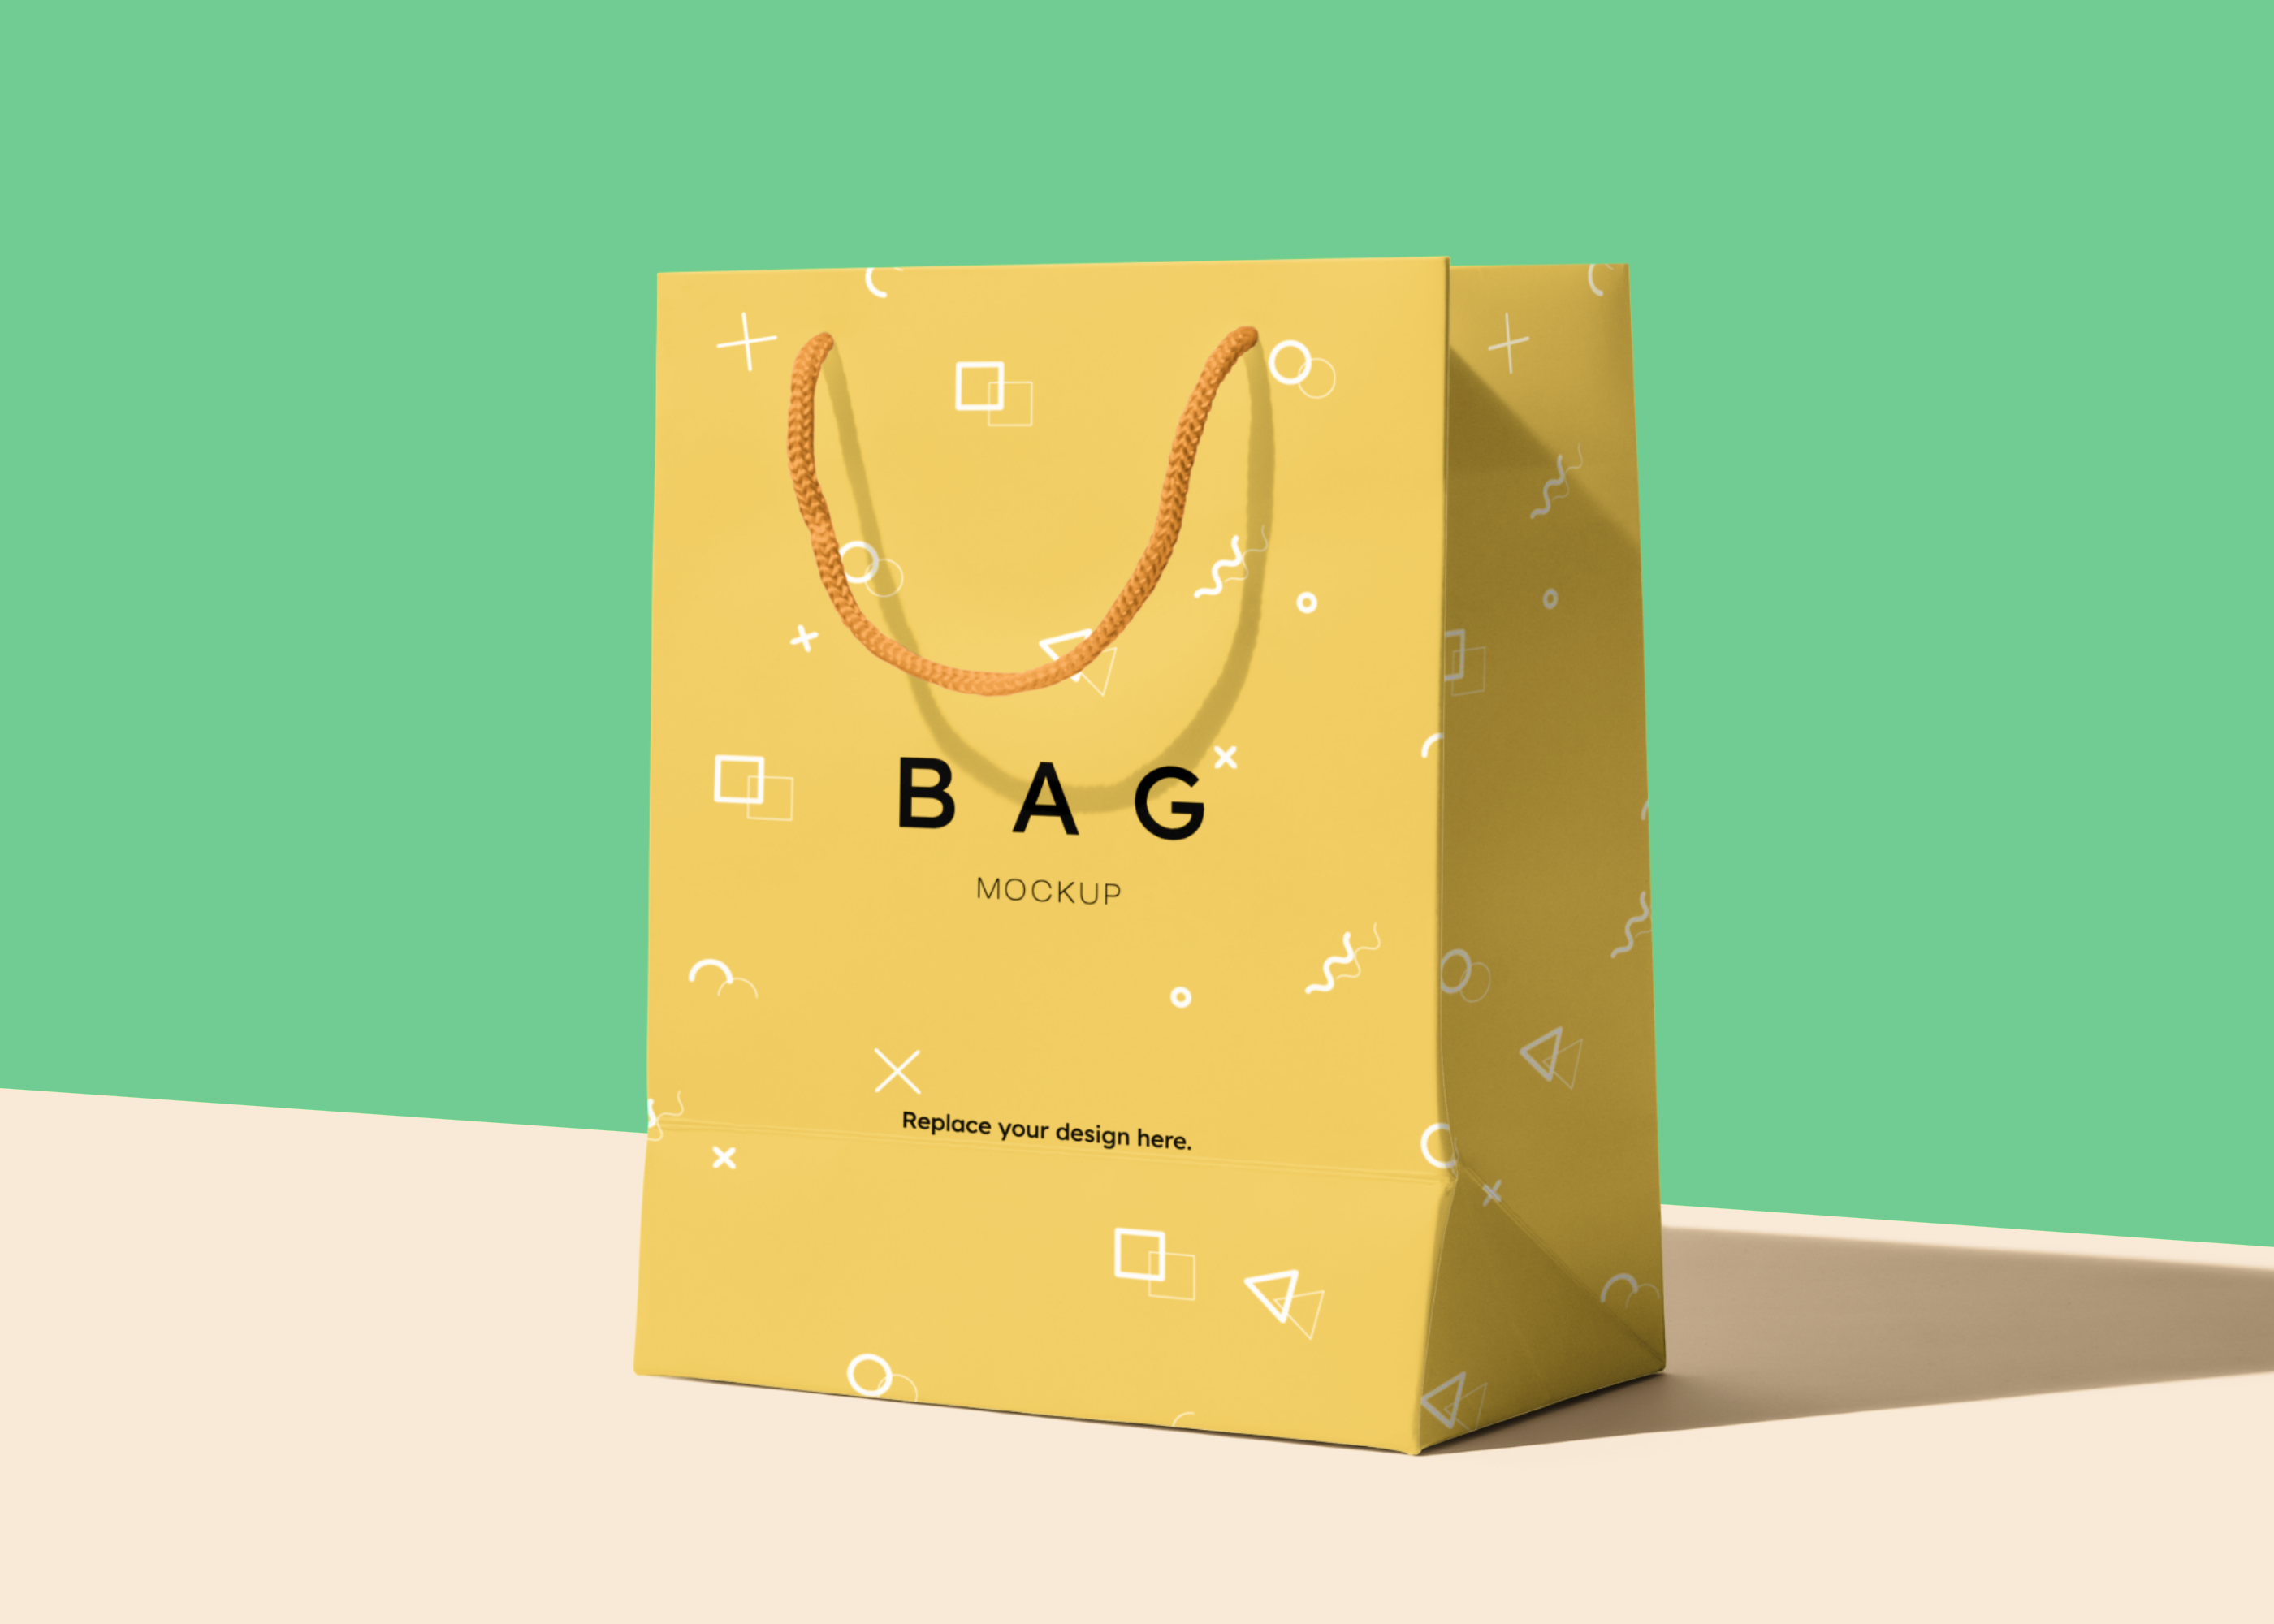 Download Paper Bag Free Psd Mockup Scene Bag Mockup Mockup Graphic Design Goodies